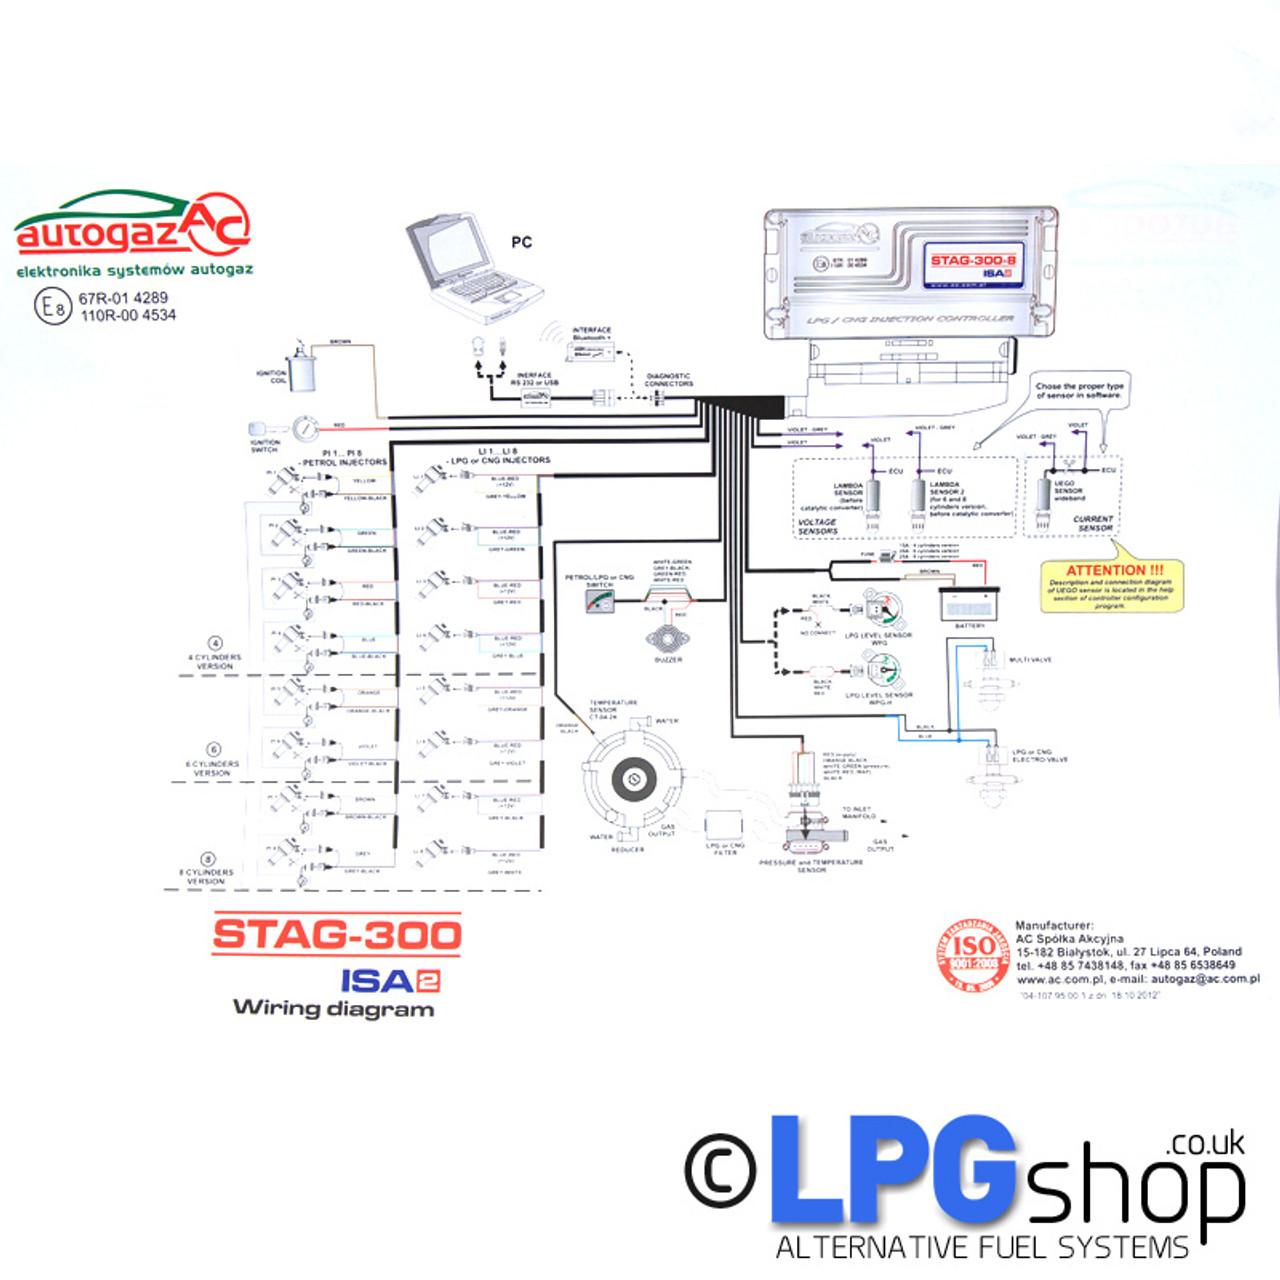 small resolution of beam propane conversion wiring diagram wiring diagram fascinatingac stag 300 isa2 8 cylinder ecu controller beam